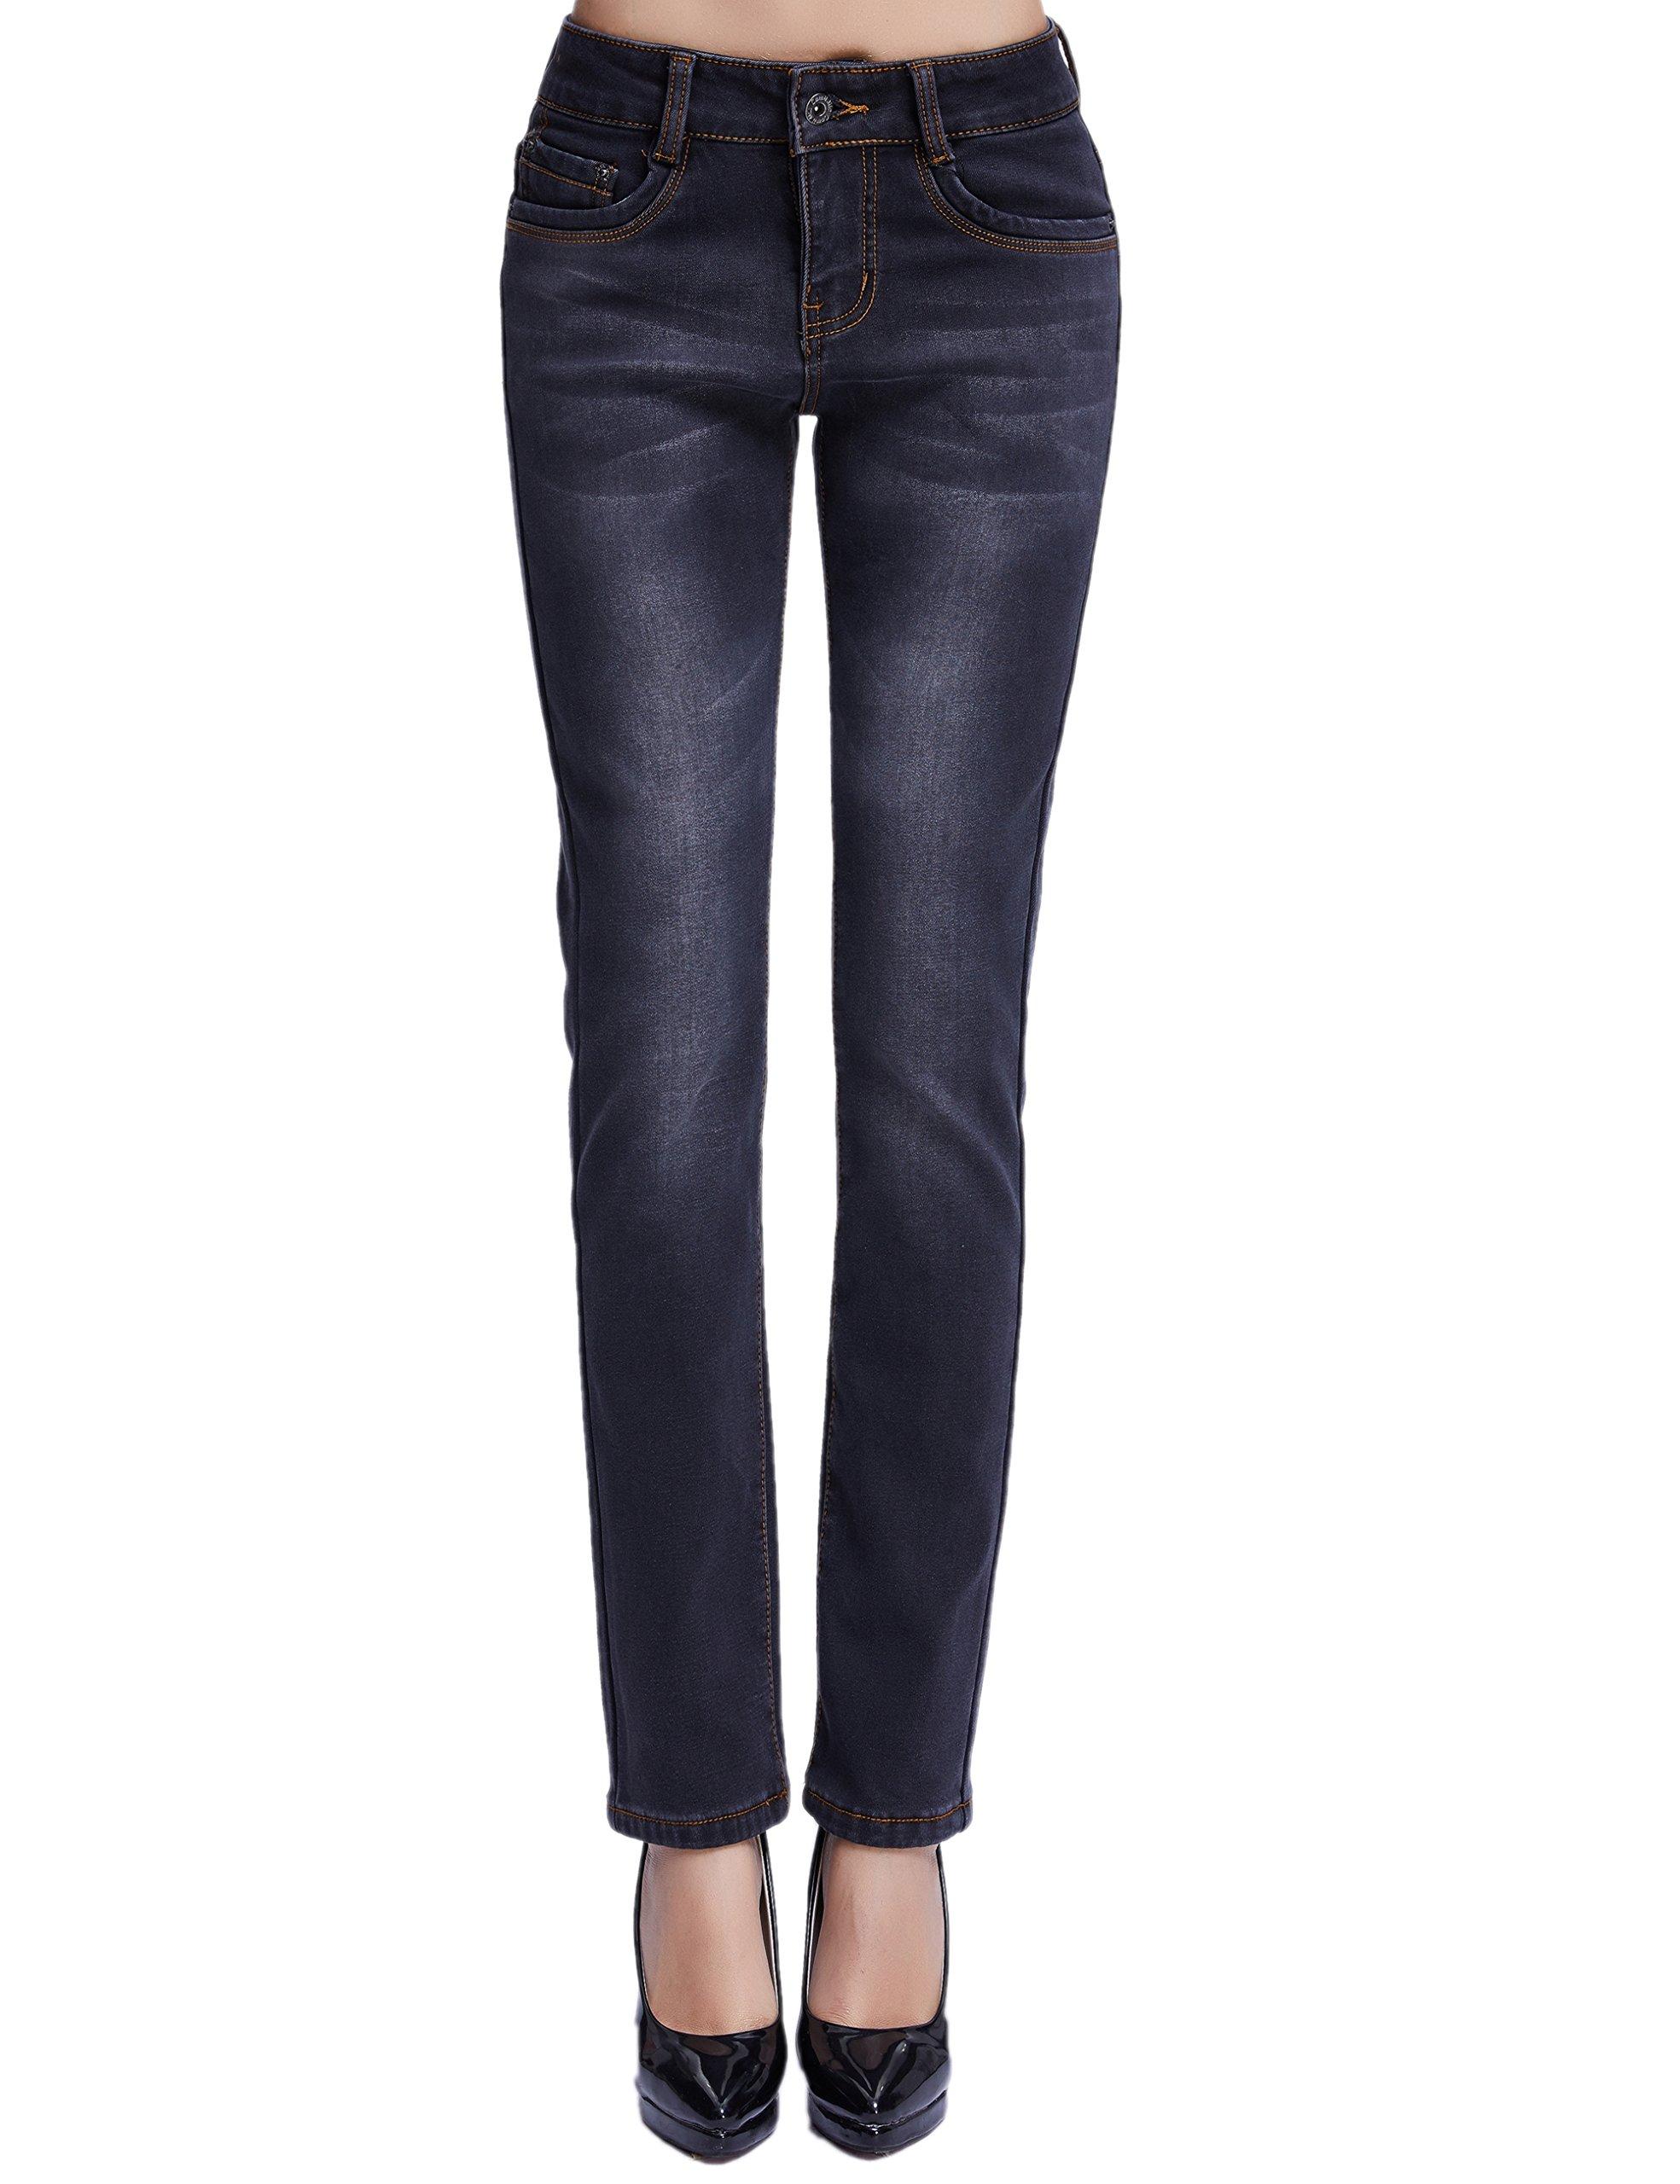 Camii Mia Women's Winter Slim Fit Thermal Jeans Pants (W28 x L32, Black (New Size))